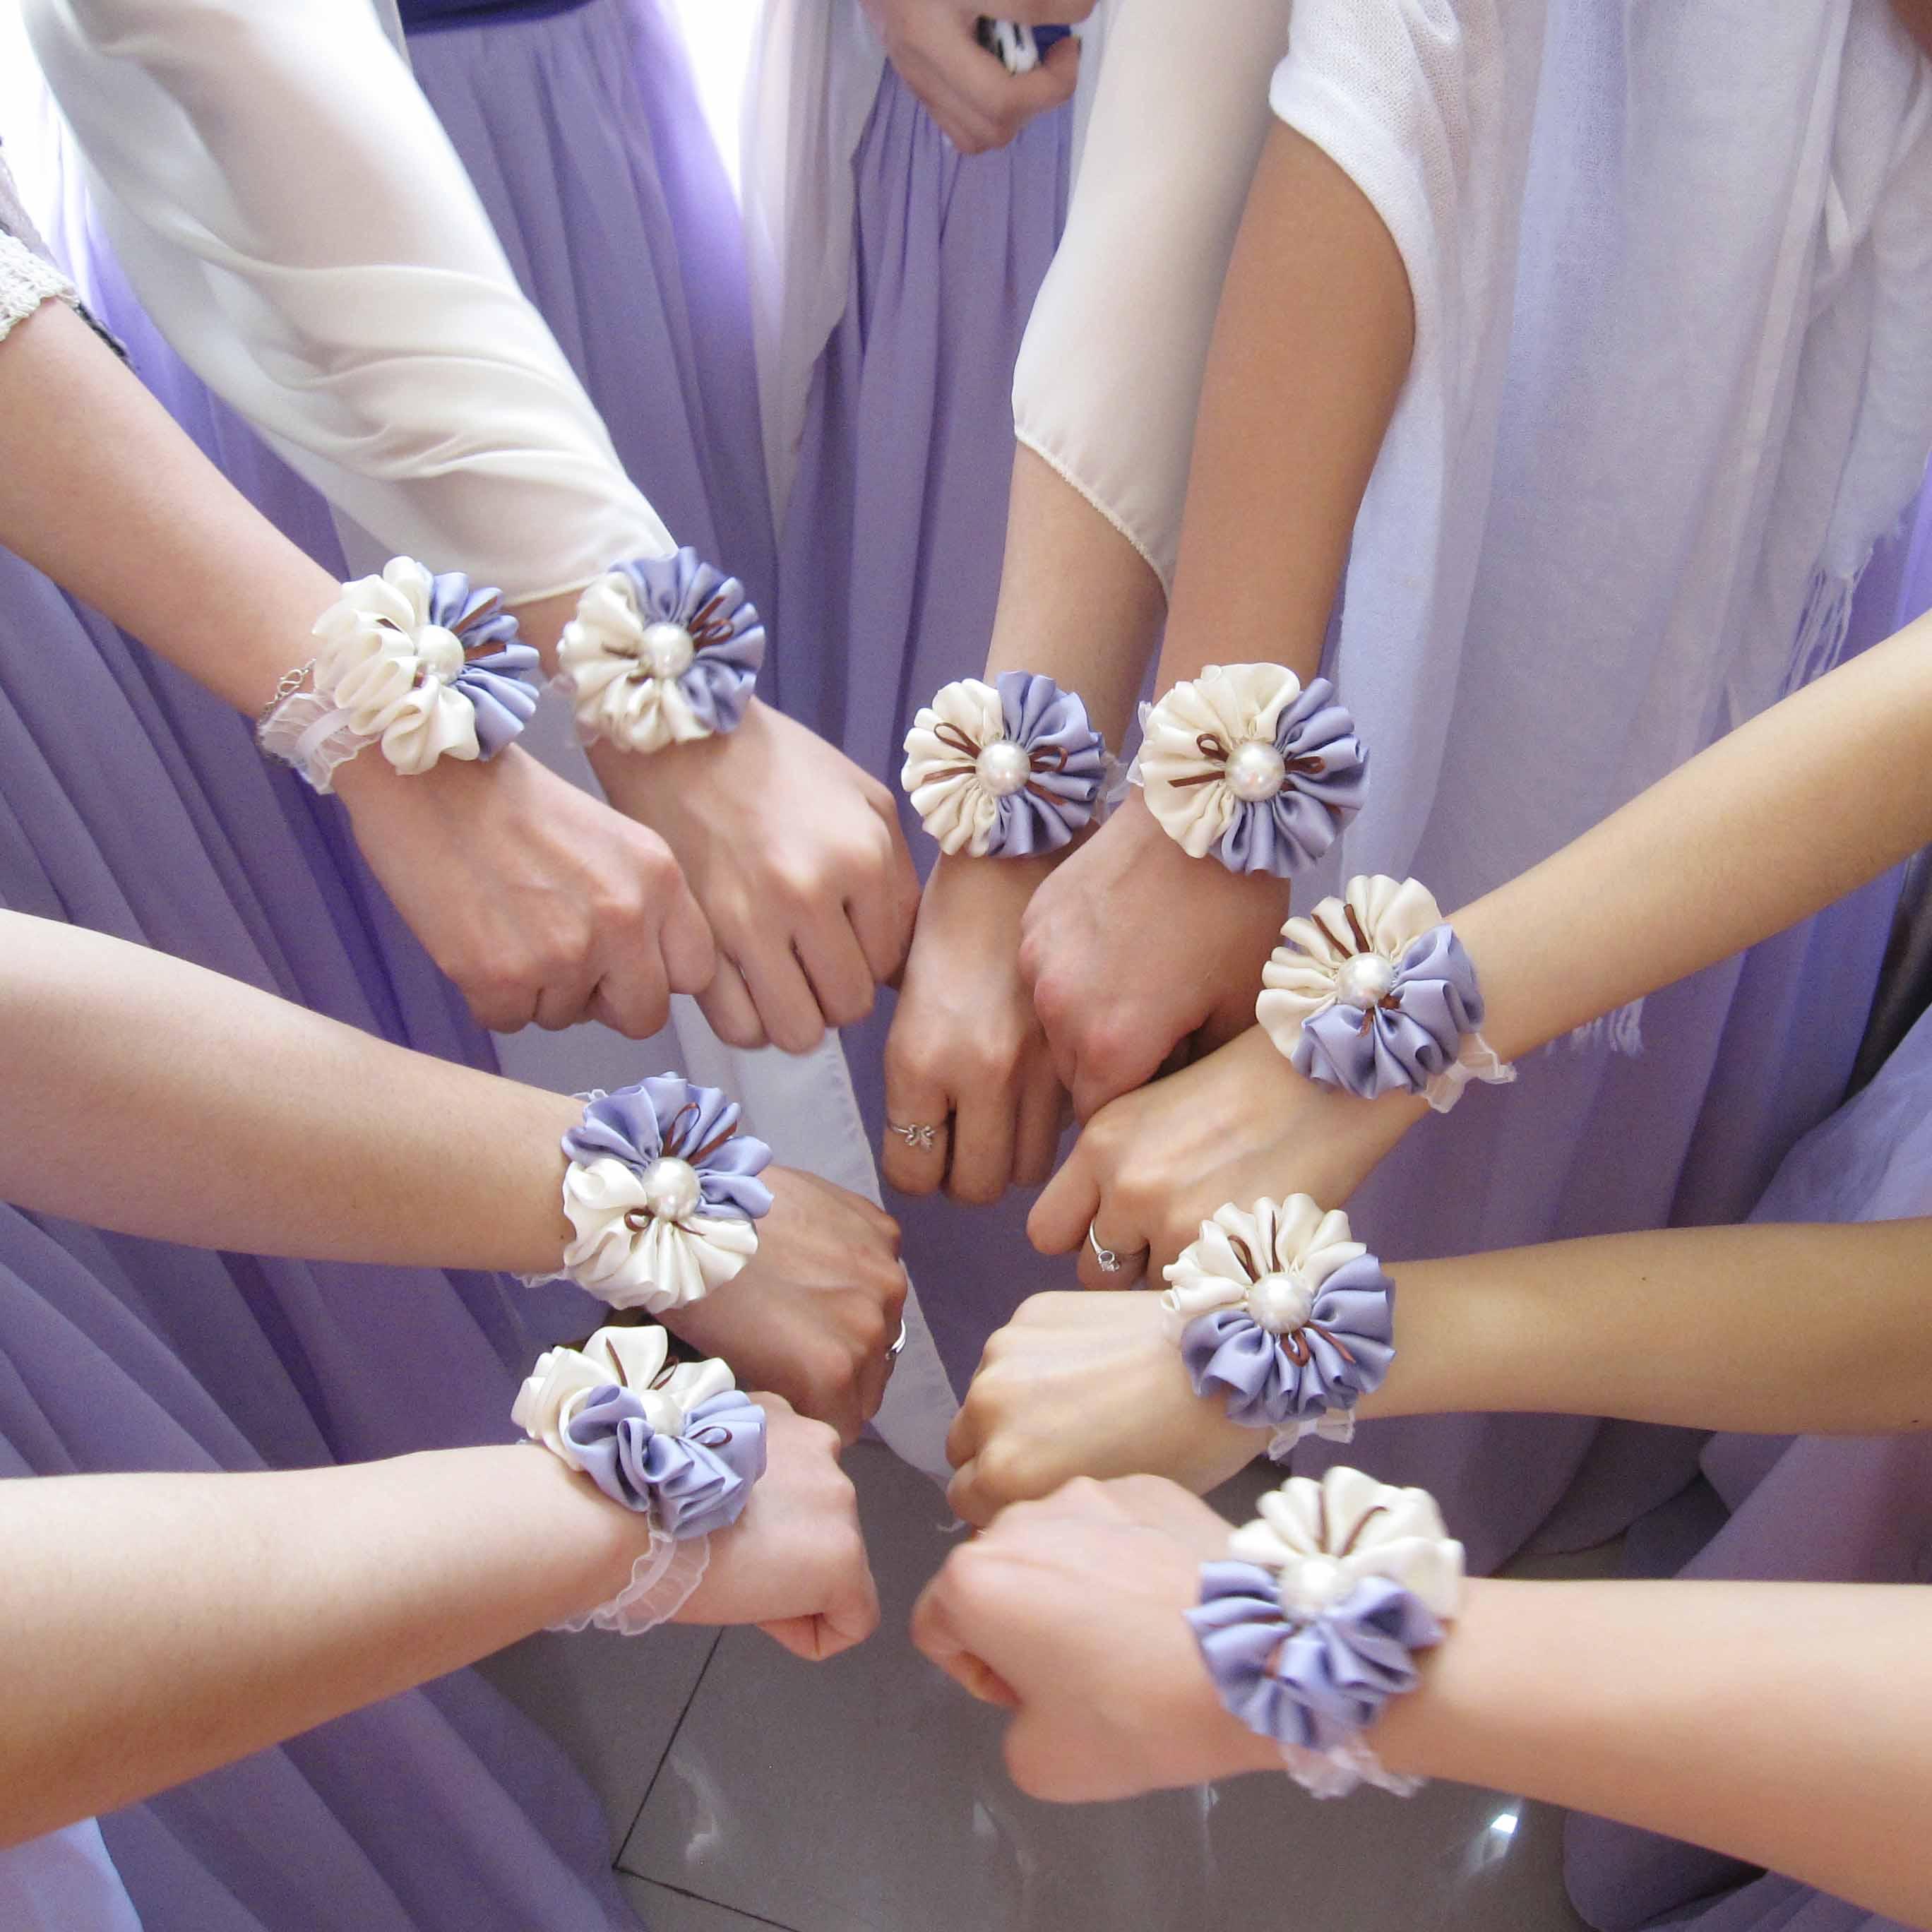 Jorya two color hand purple wrist length corsage flower corsages for jorya two color hand purple wrist length corsage flower corsages for prom in wedding bouquets from weddings events on aliexpress alibaba group izmirmasajfo